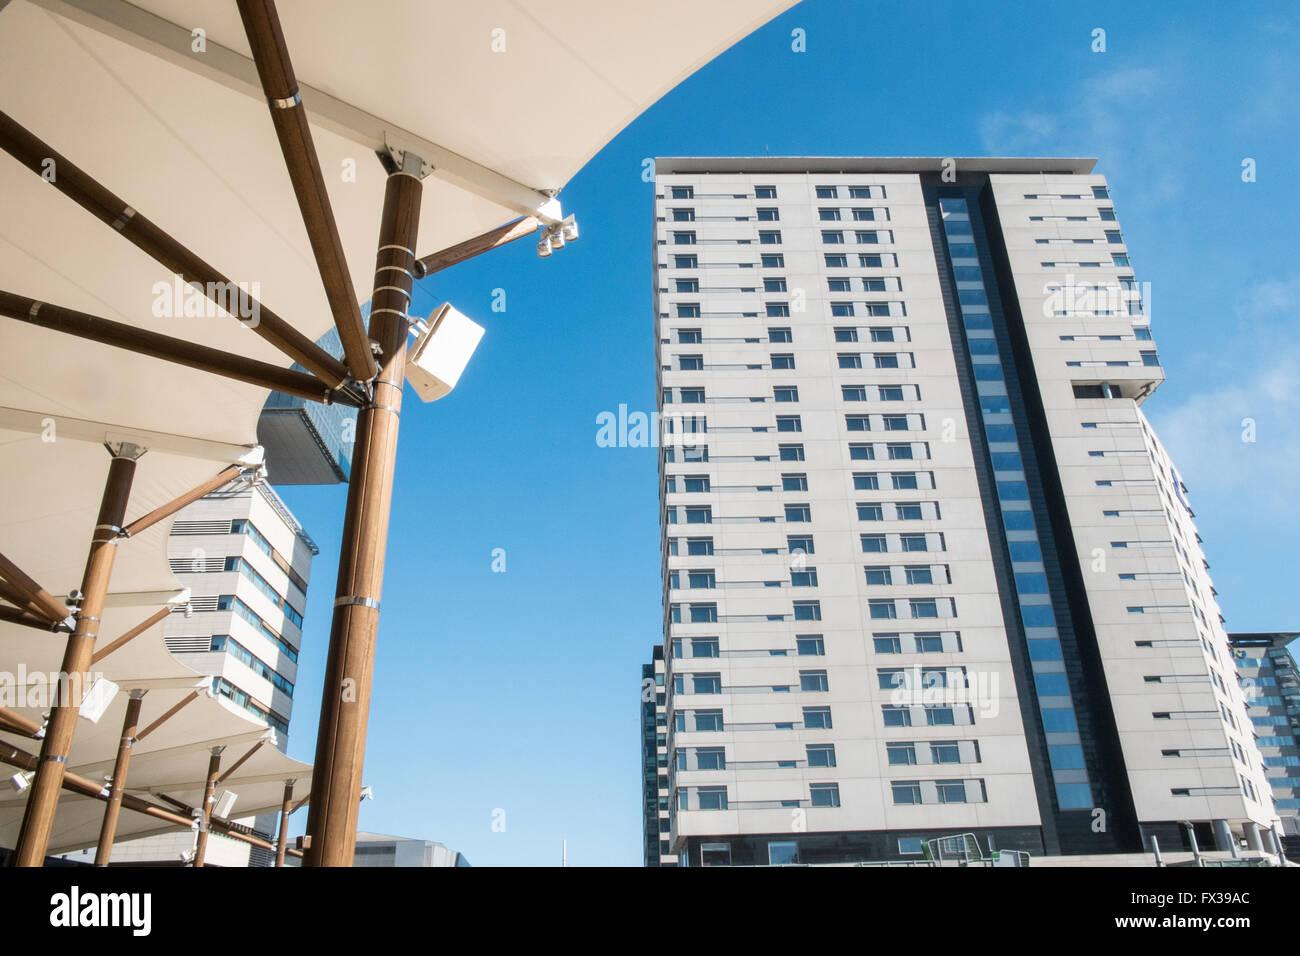 Diagonal Mar Hilton Hotel and canopy of Diagonal Mar Shopping Centre along Passeig del Taulat street,Port Forum,Barcelona. - Stock Image